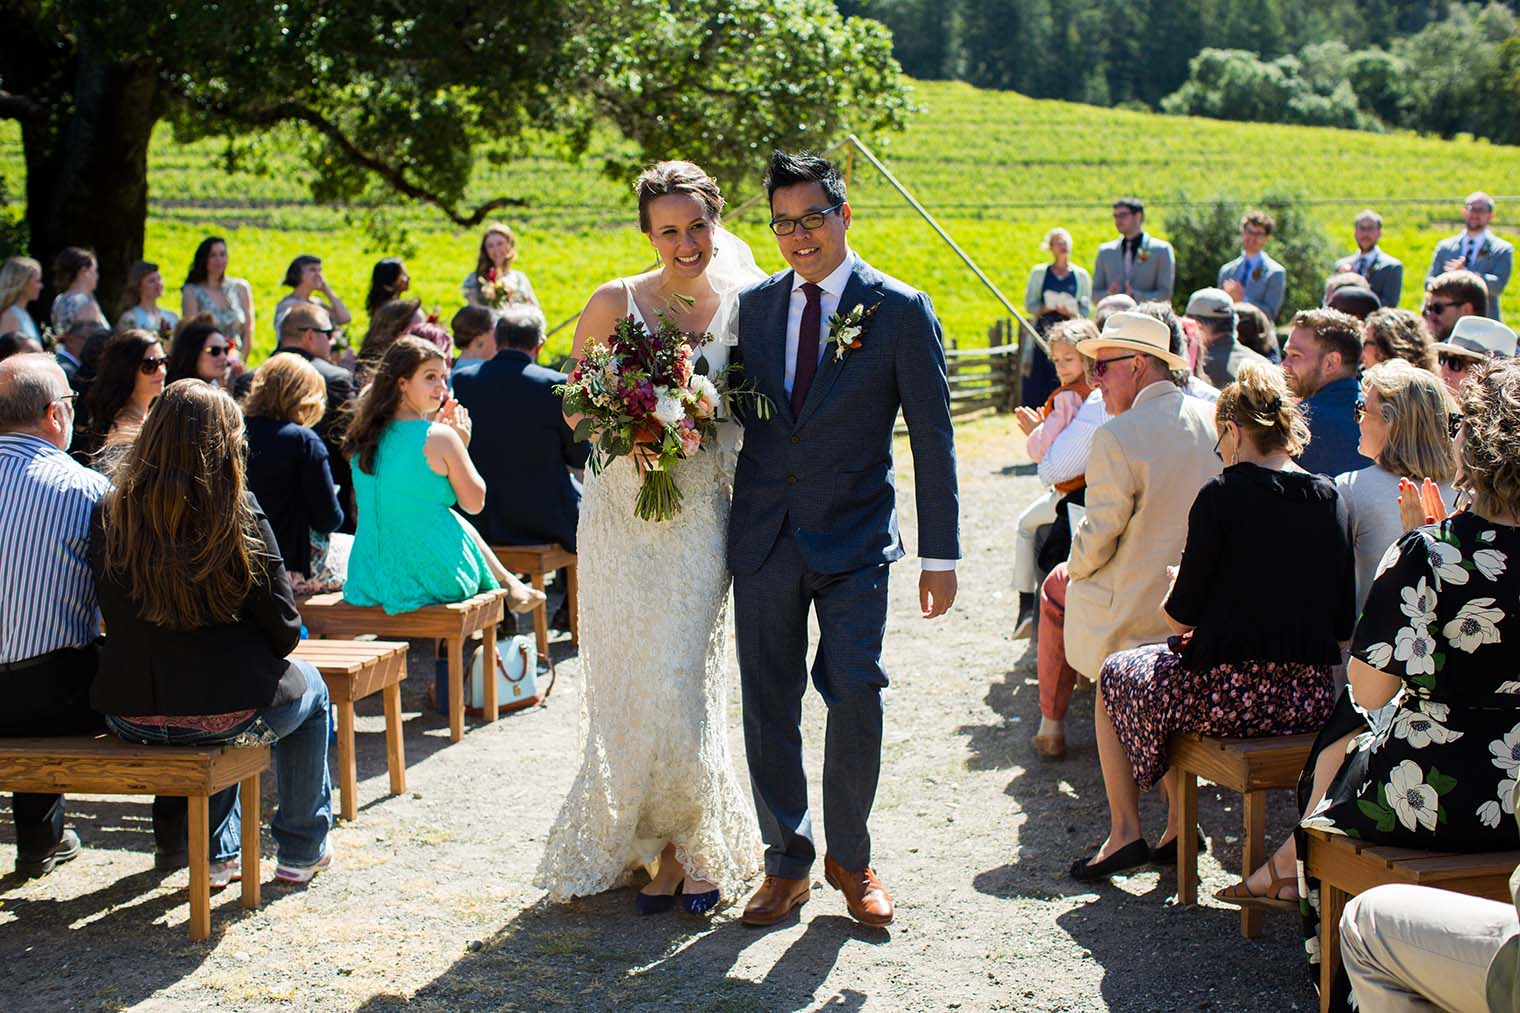 jack london state historic park wedding photographer